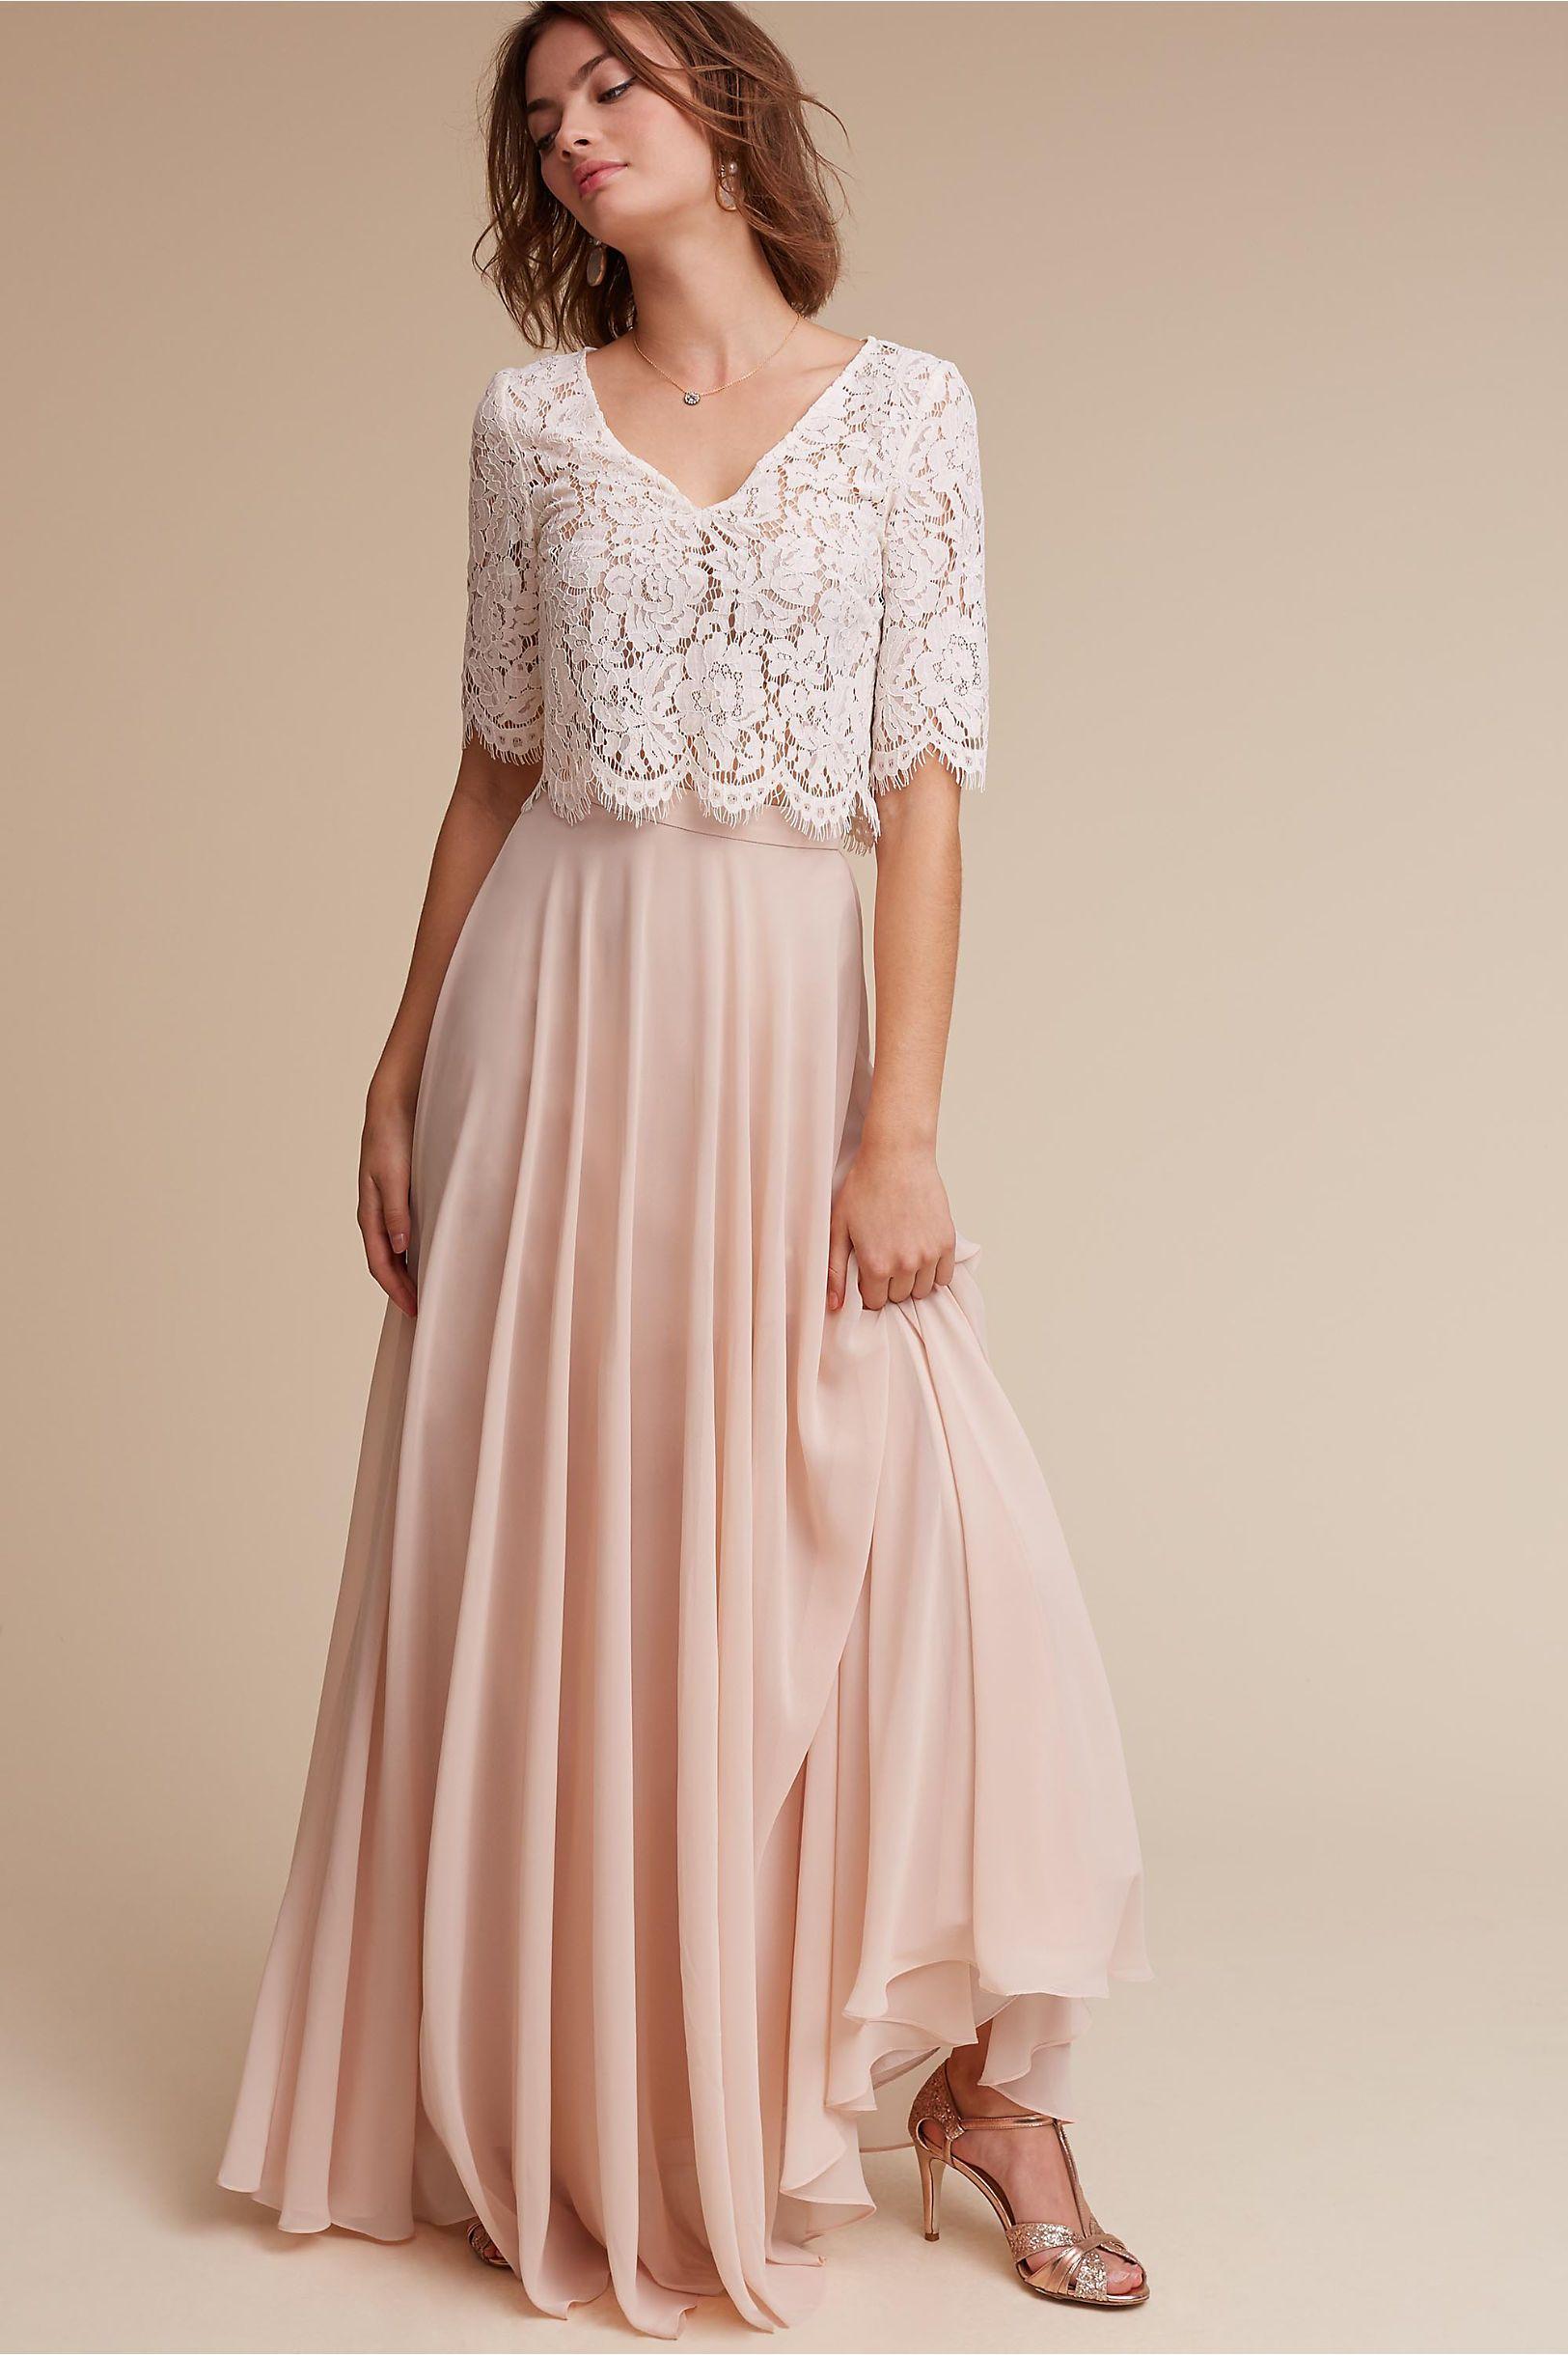 Hampton skirt rehearsal dress bhldn hampton skirt in bridesmaids bridesmaid separates bhldn ombrellifo Choice Image